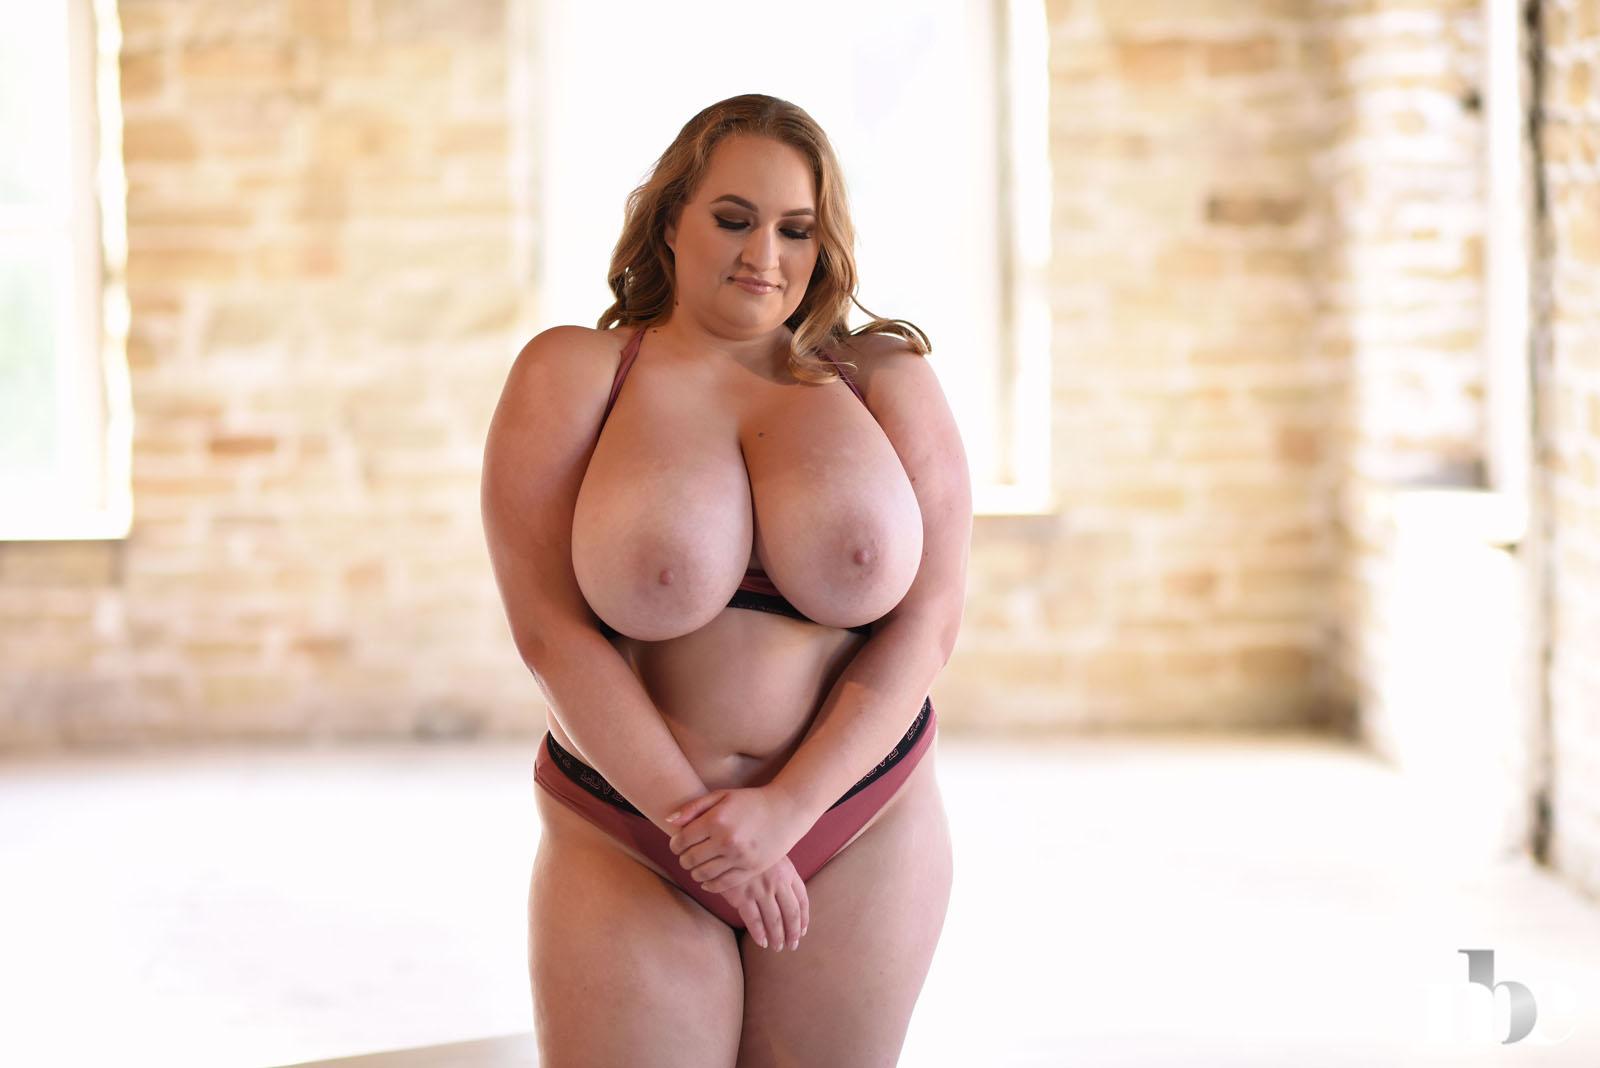 Voluptuous nude babes